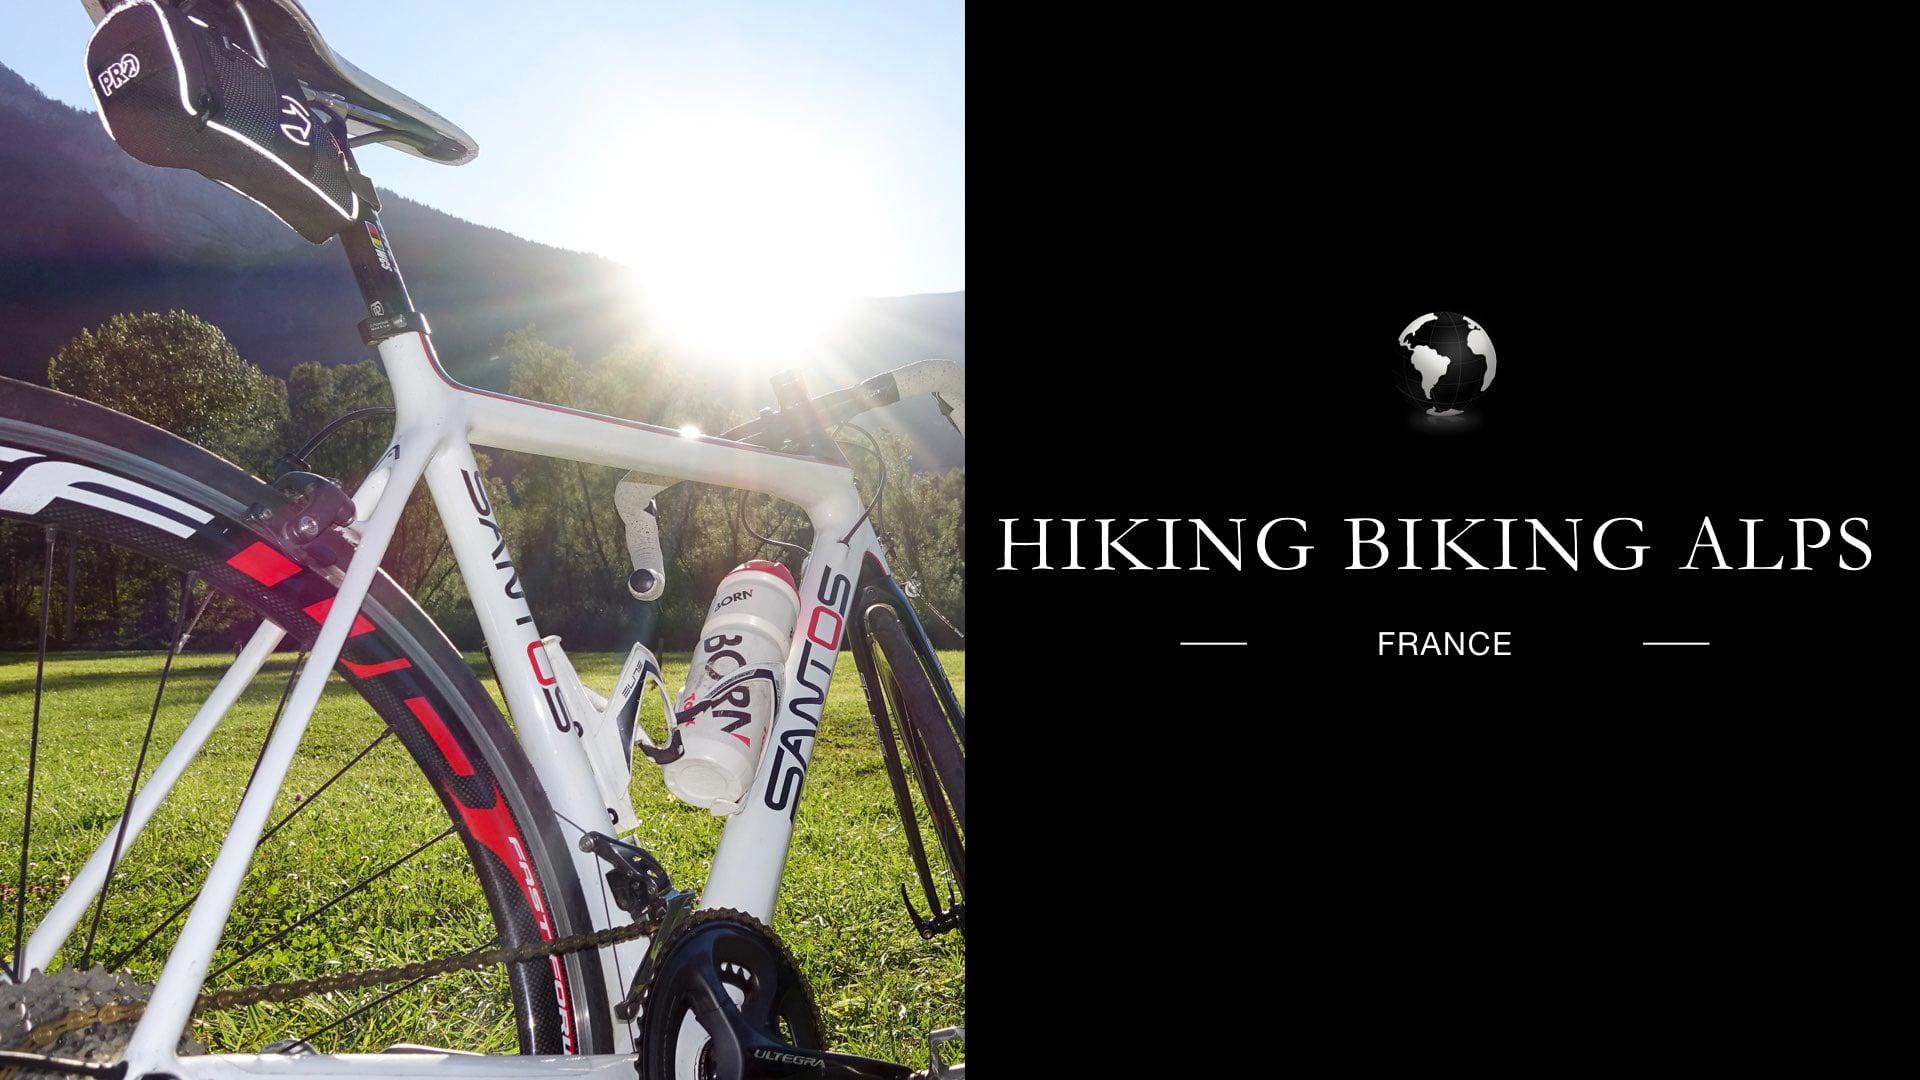 201708 Hiking and Biking Alps